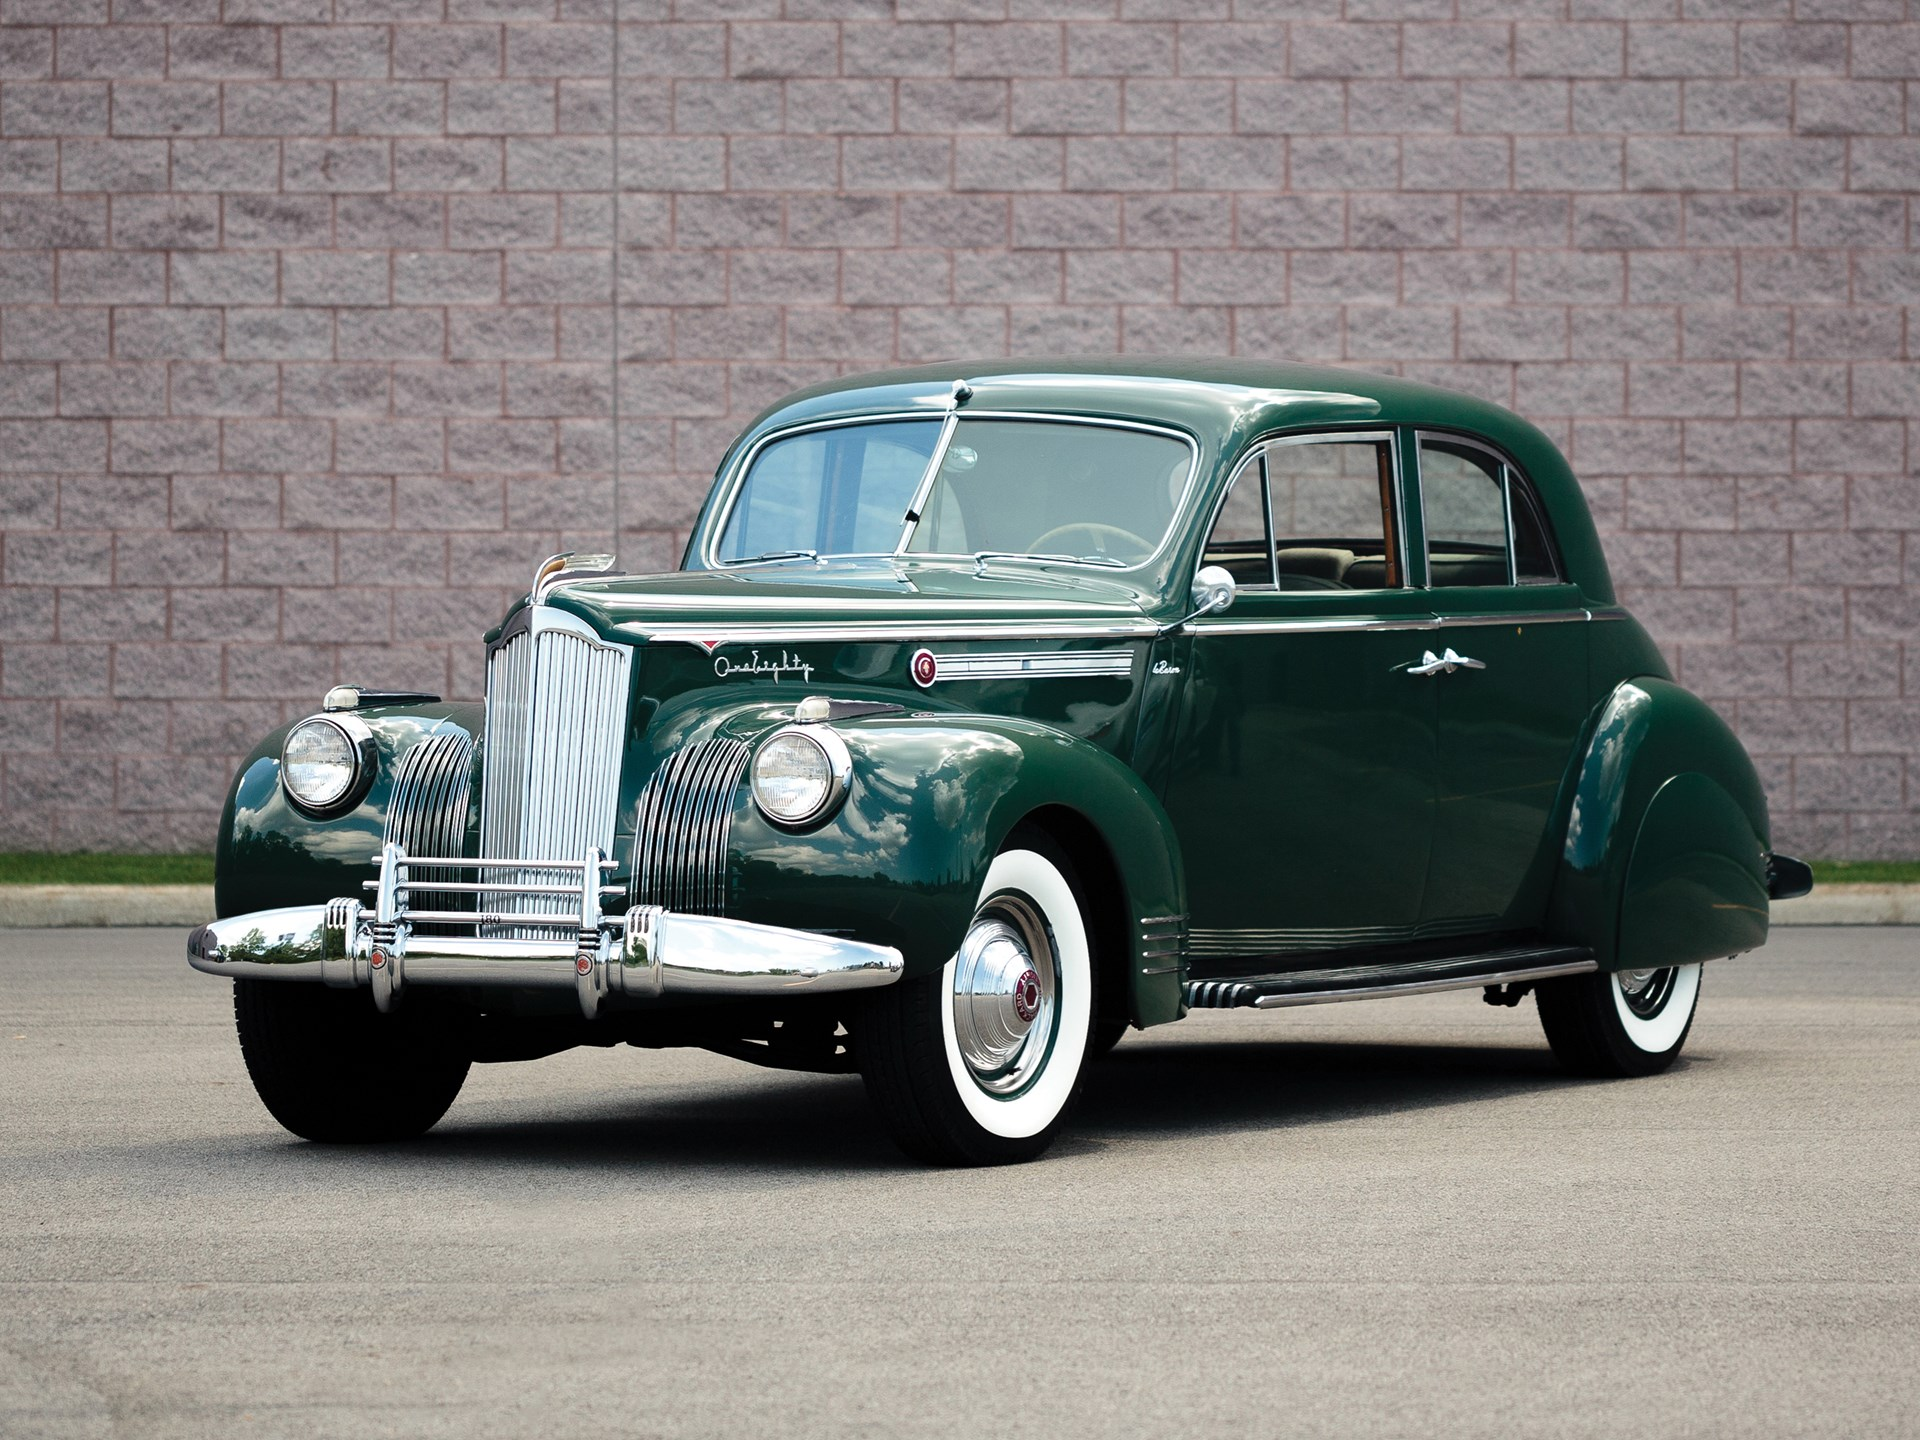 RM Sotheby's - 1941 Packard Custom Super Eight One Eighty Sport